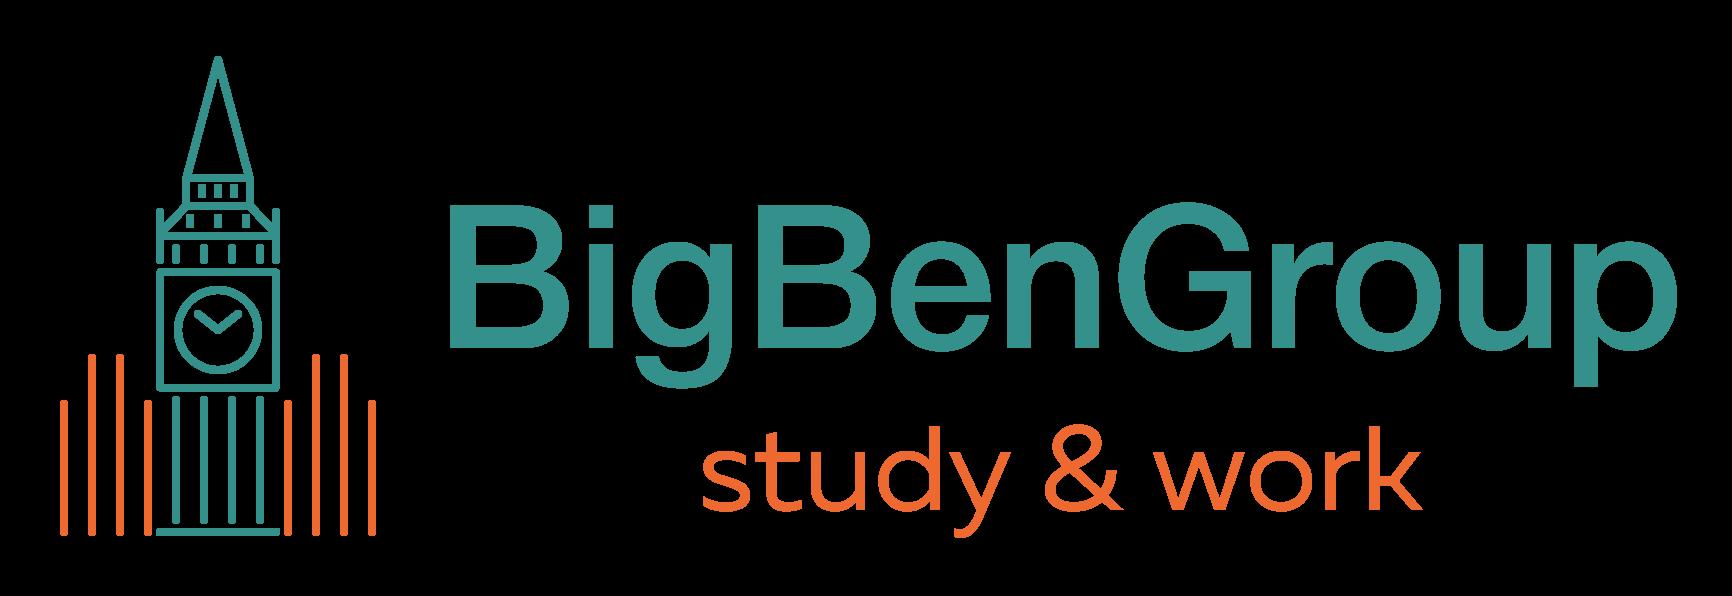 bigbengroupwork